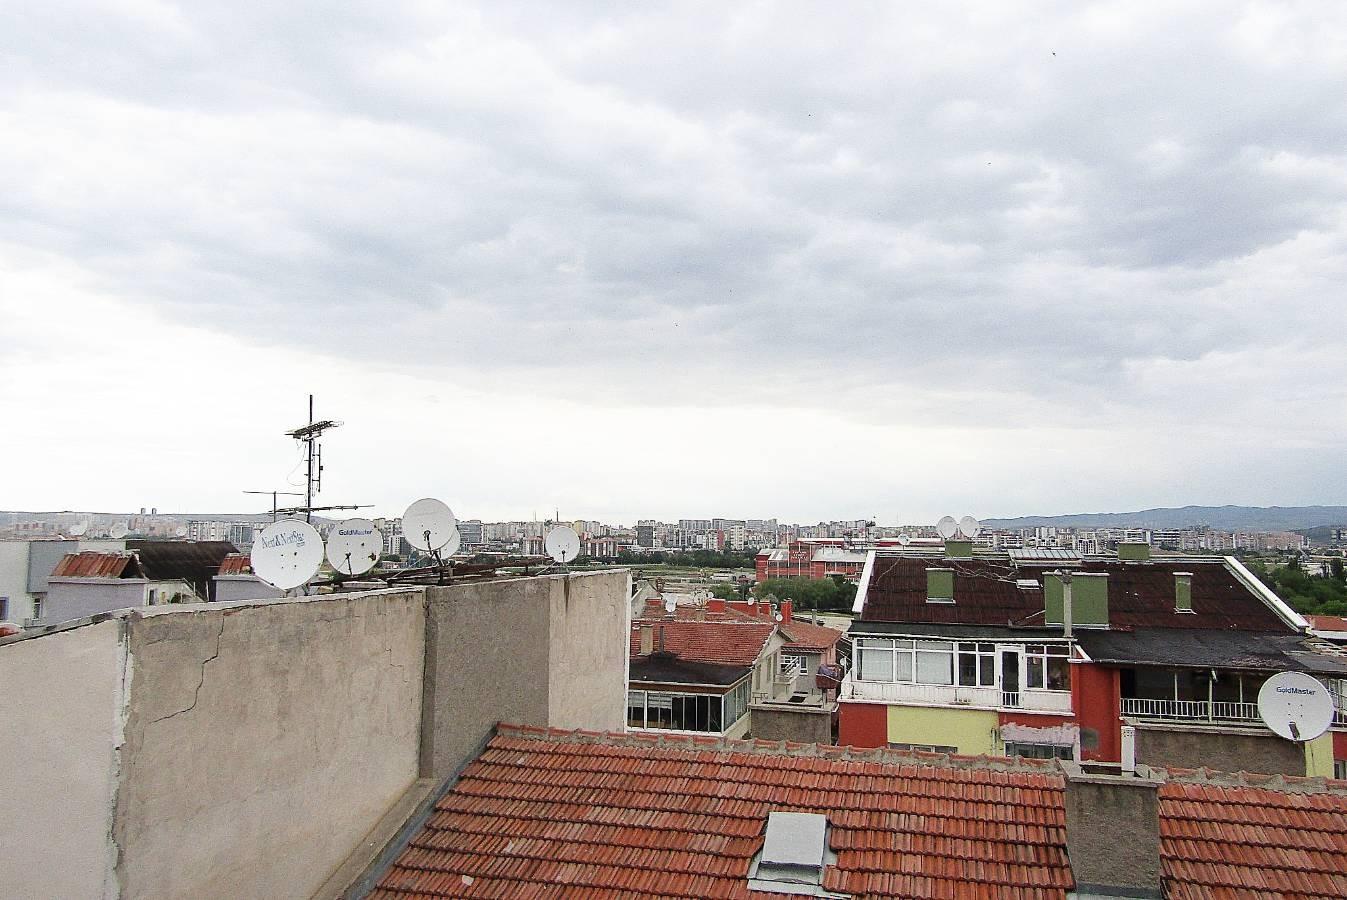 SR EMLAK'TAN K.KARABEKİR MAH'DE  5+1 250m² MANZARALI ÖN CEPHE TERAS